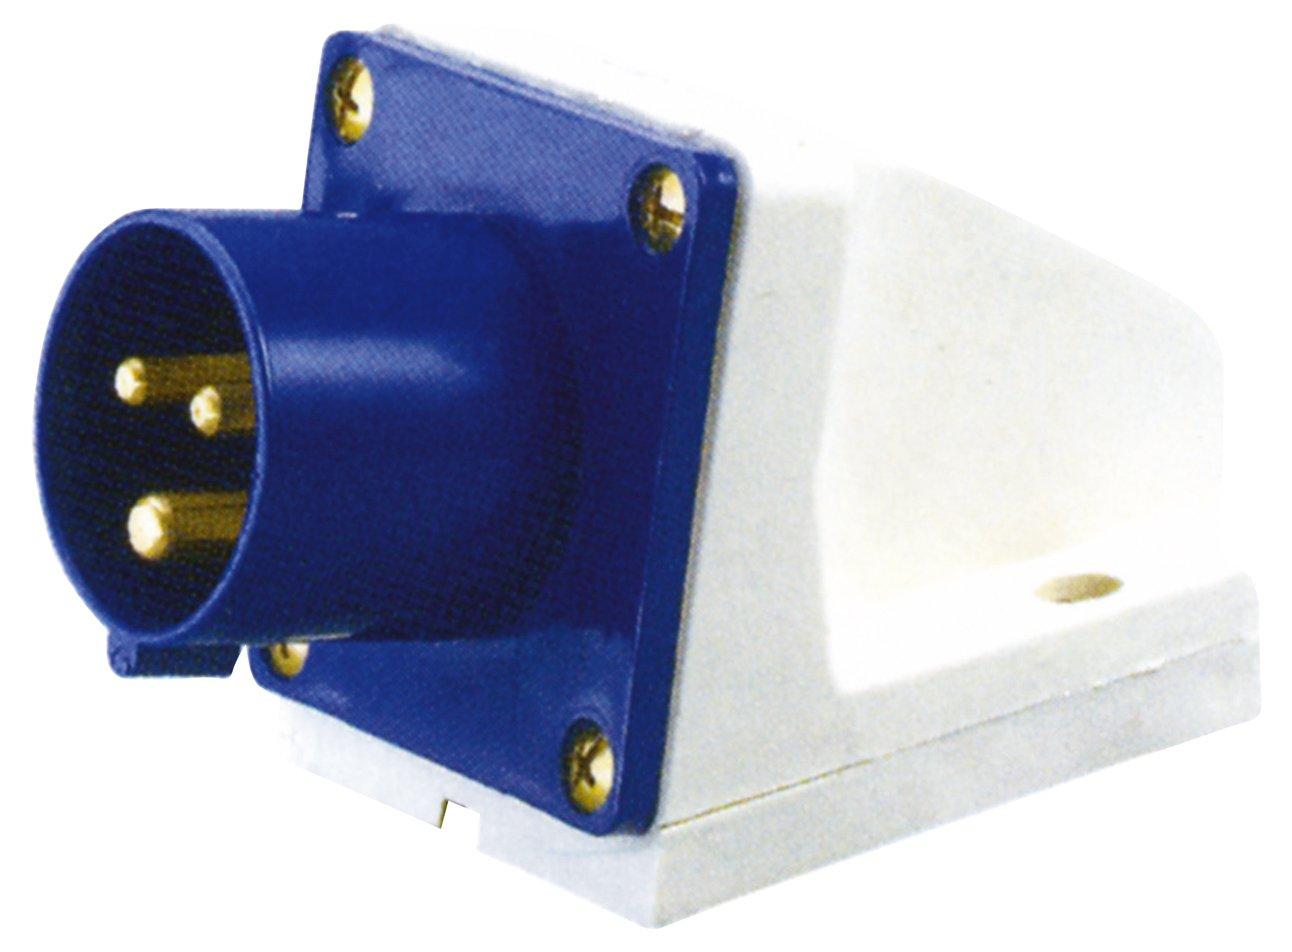 CEE Wandstecker Abgewinkelt Blau 230V 32A E302BE Altai